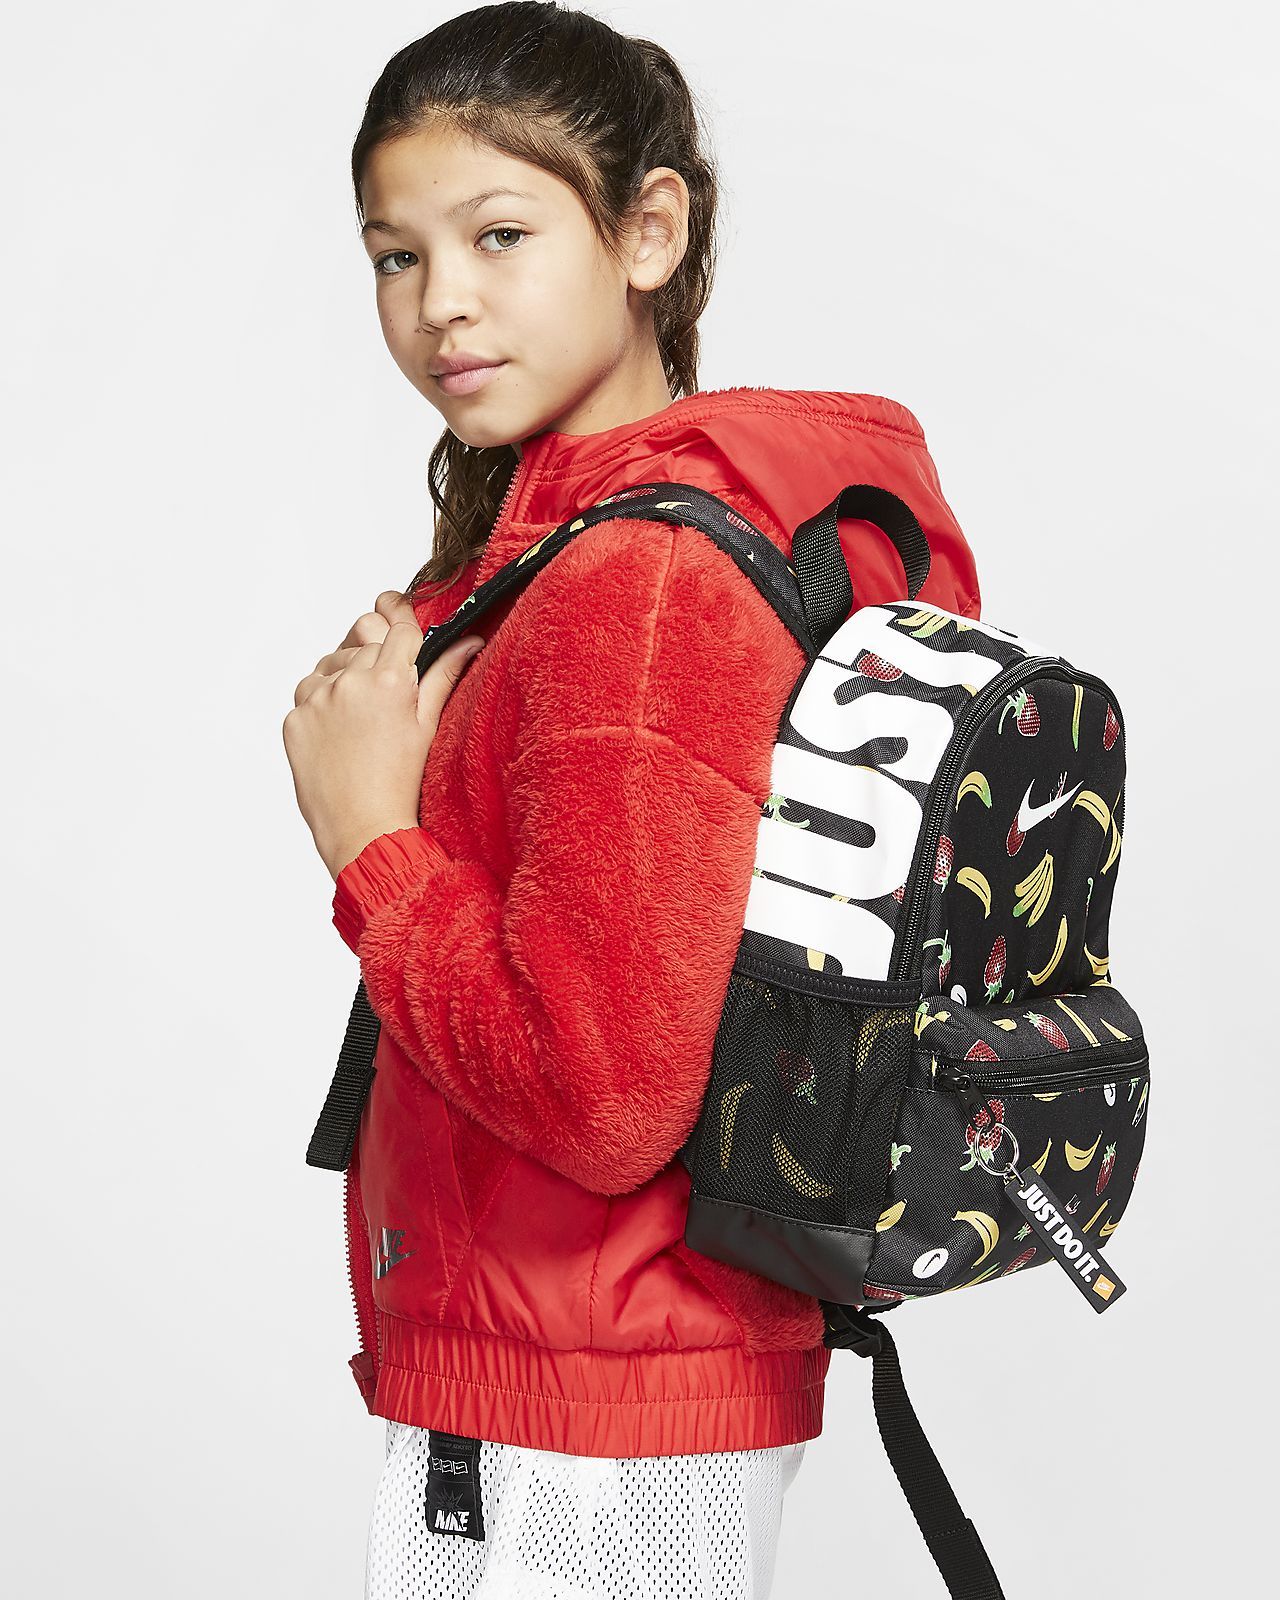 Nike Brasilia JDI Motxilla estampada (petita) Nena